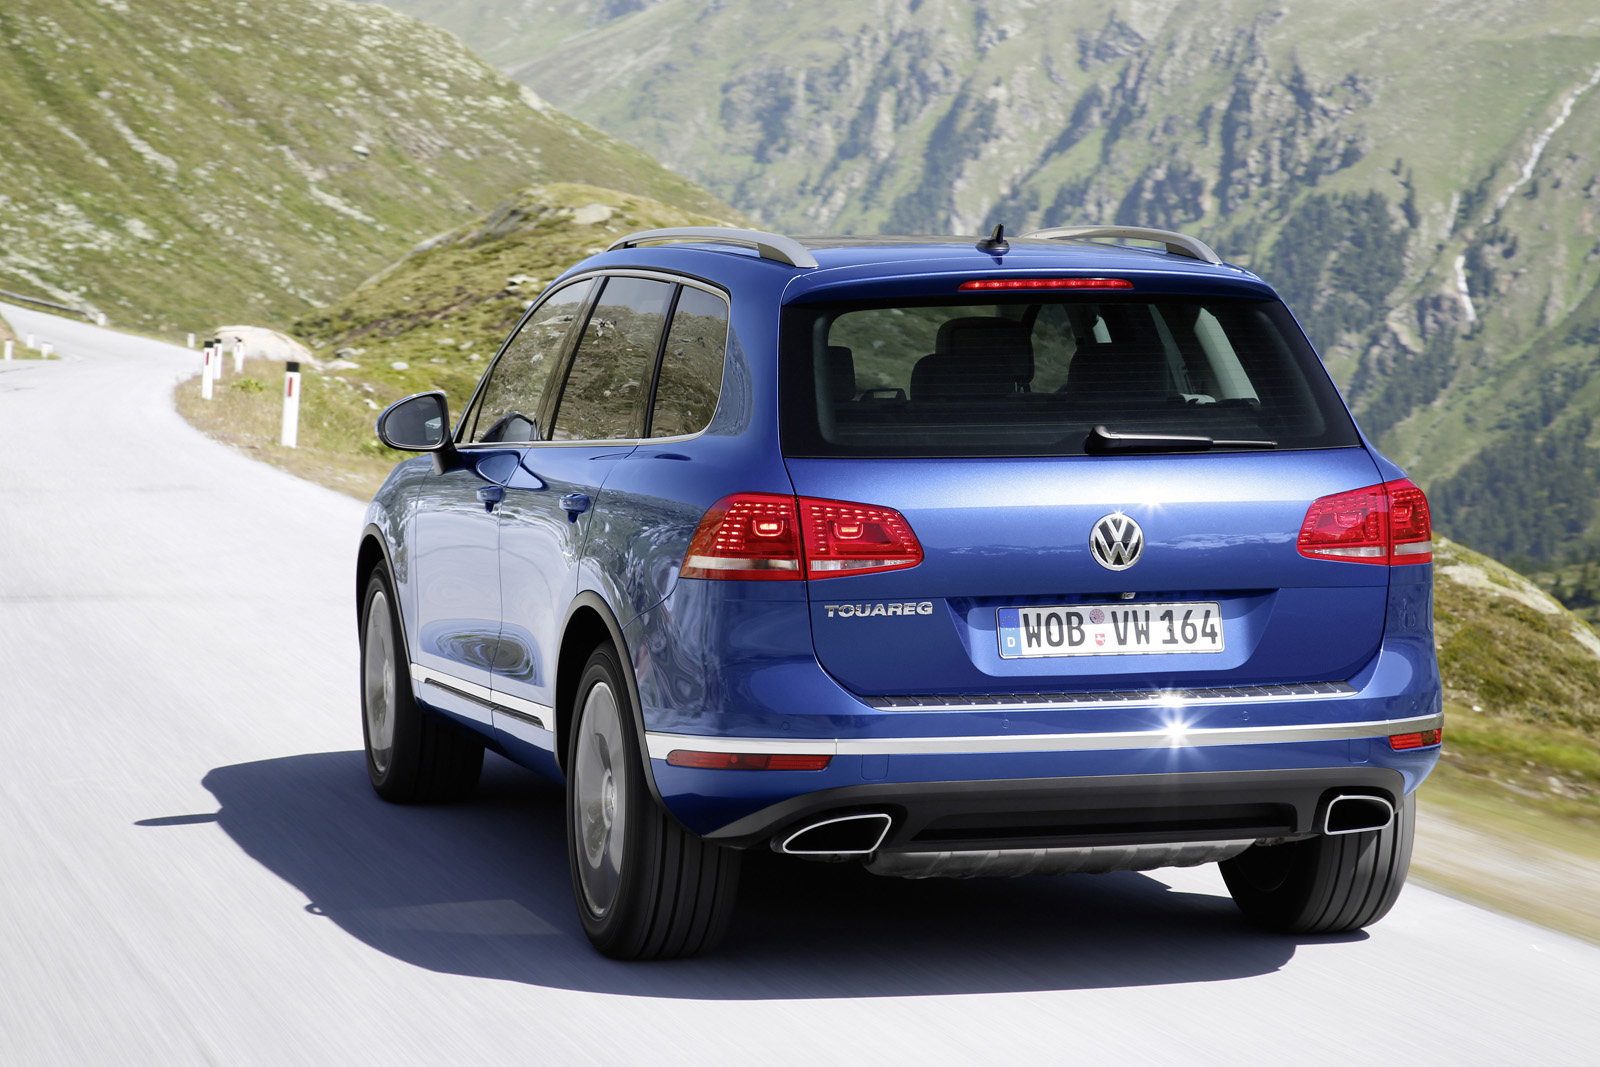 passat cars articles com volkswagen news alert recall